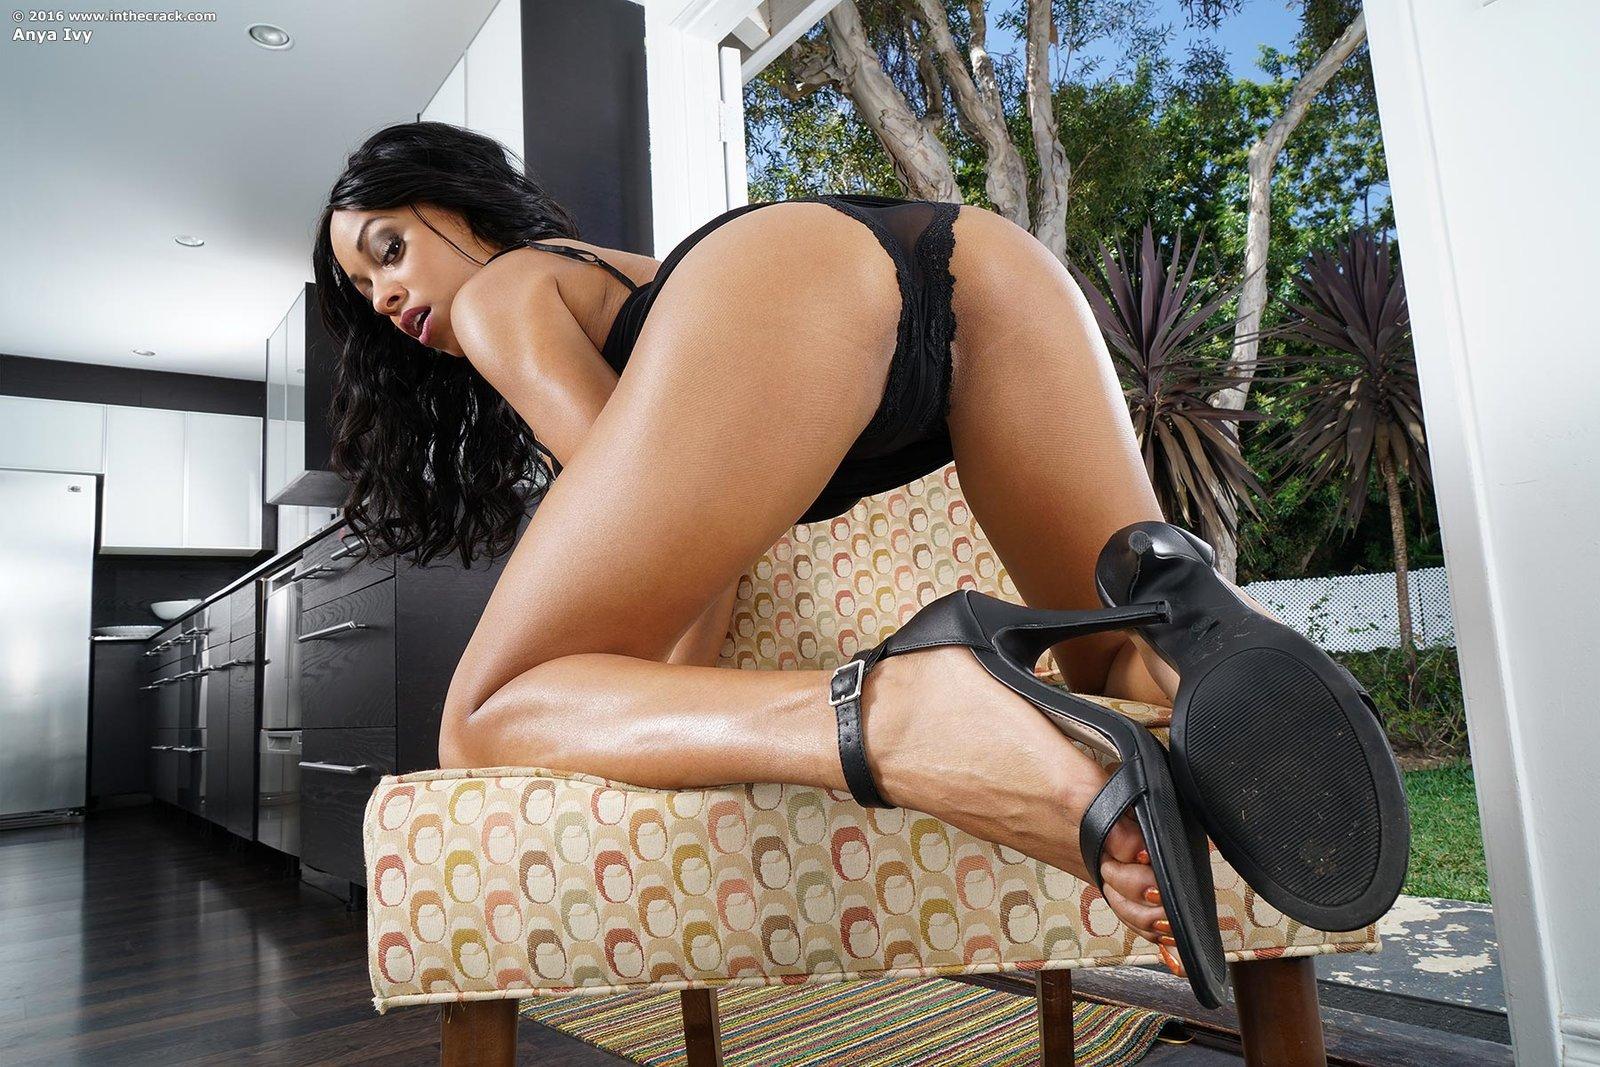 Ivy porn star